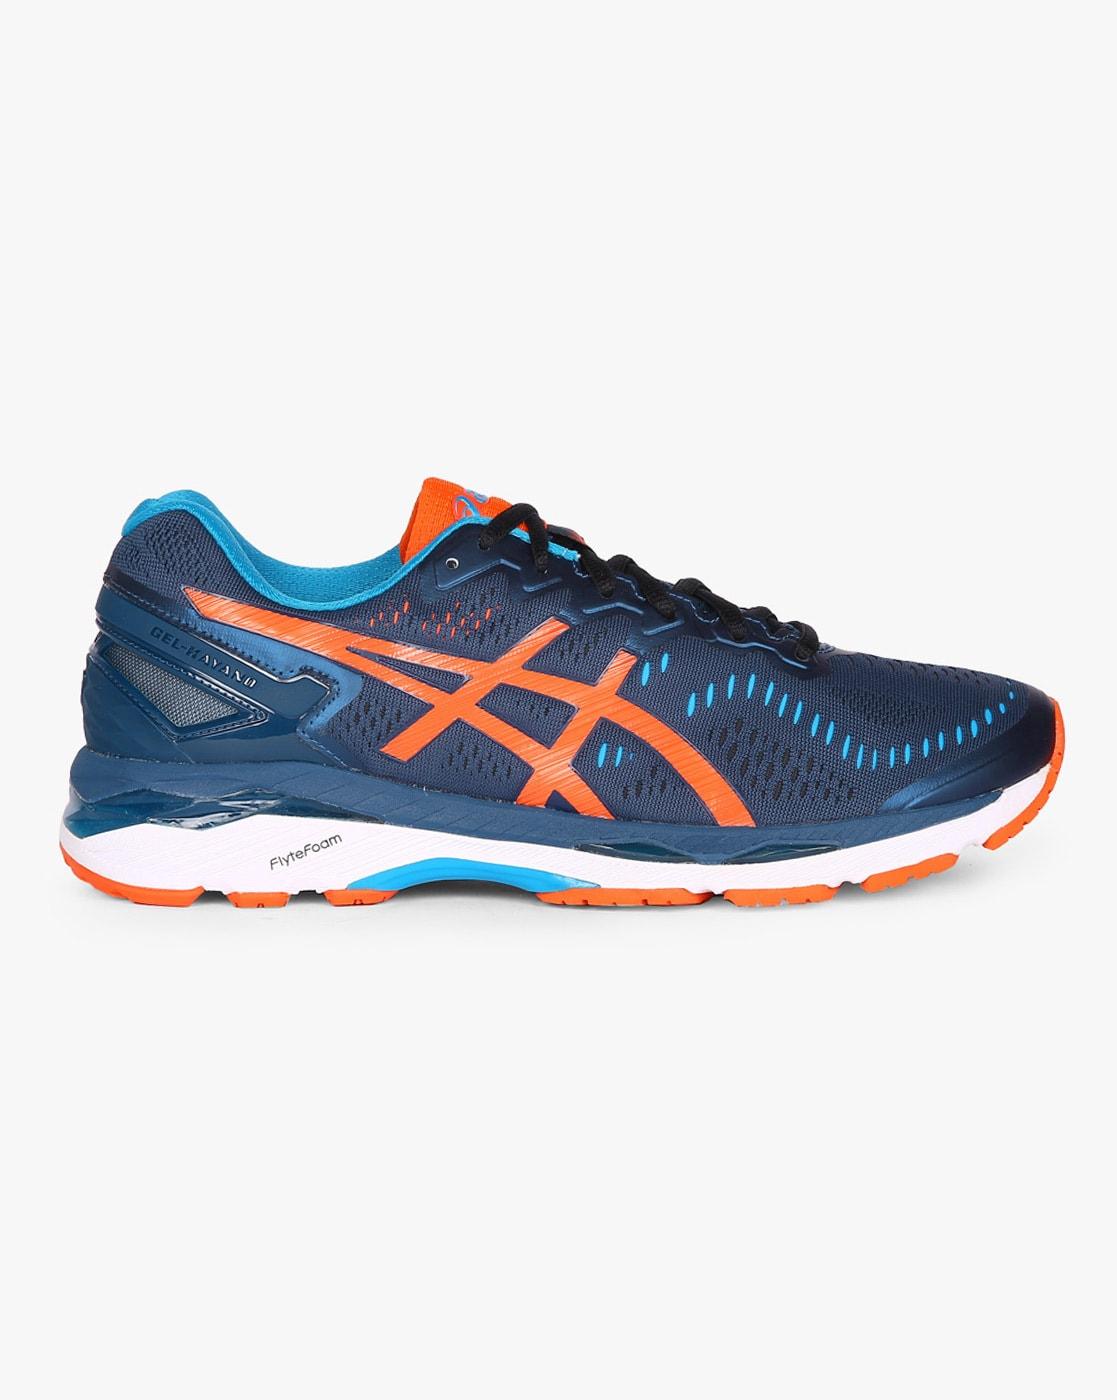 Buy Navy Blue \u0026 Orange Sports Shoes for